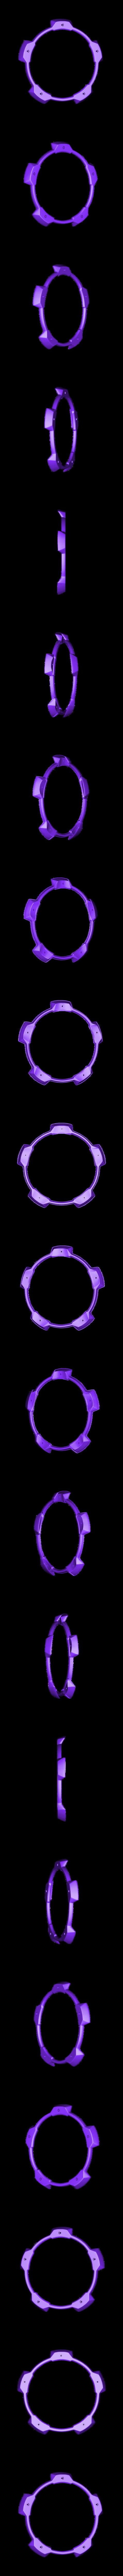 Lucio_frontCrown.stl Download free STL file Overwatch Lucio Blaster • 3D printer object, Adafruit